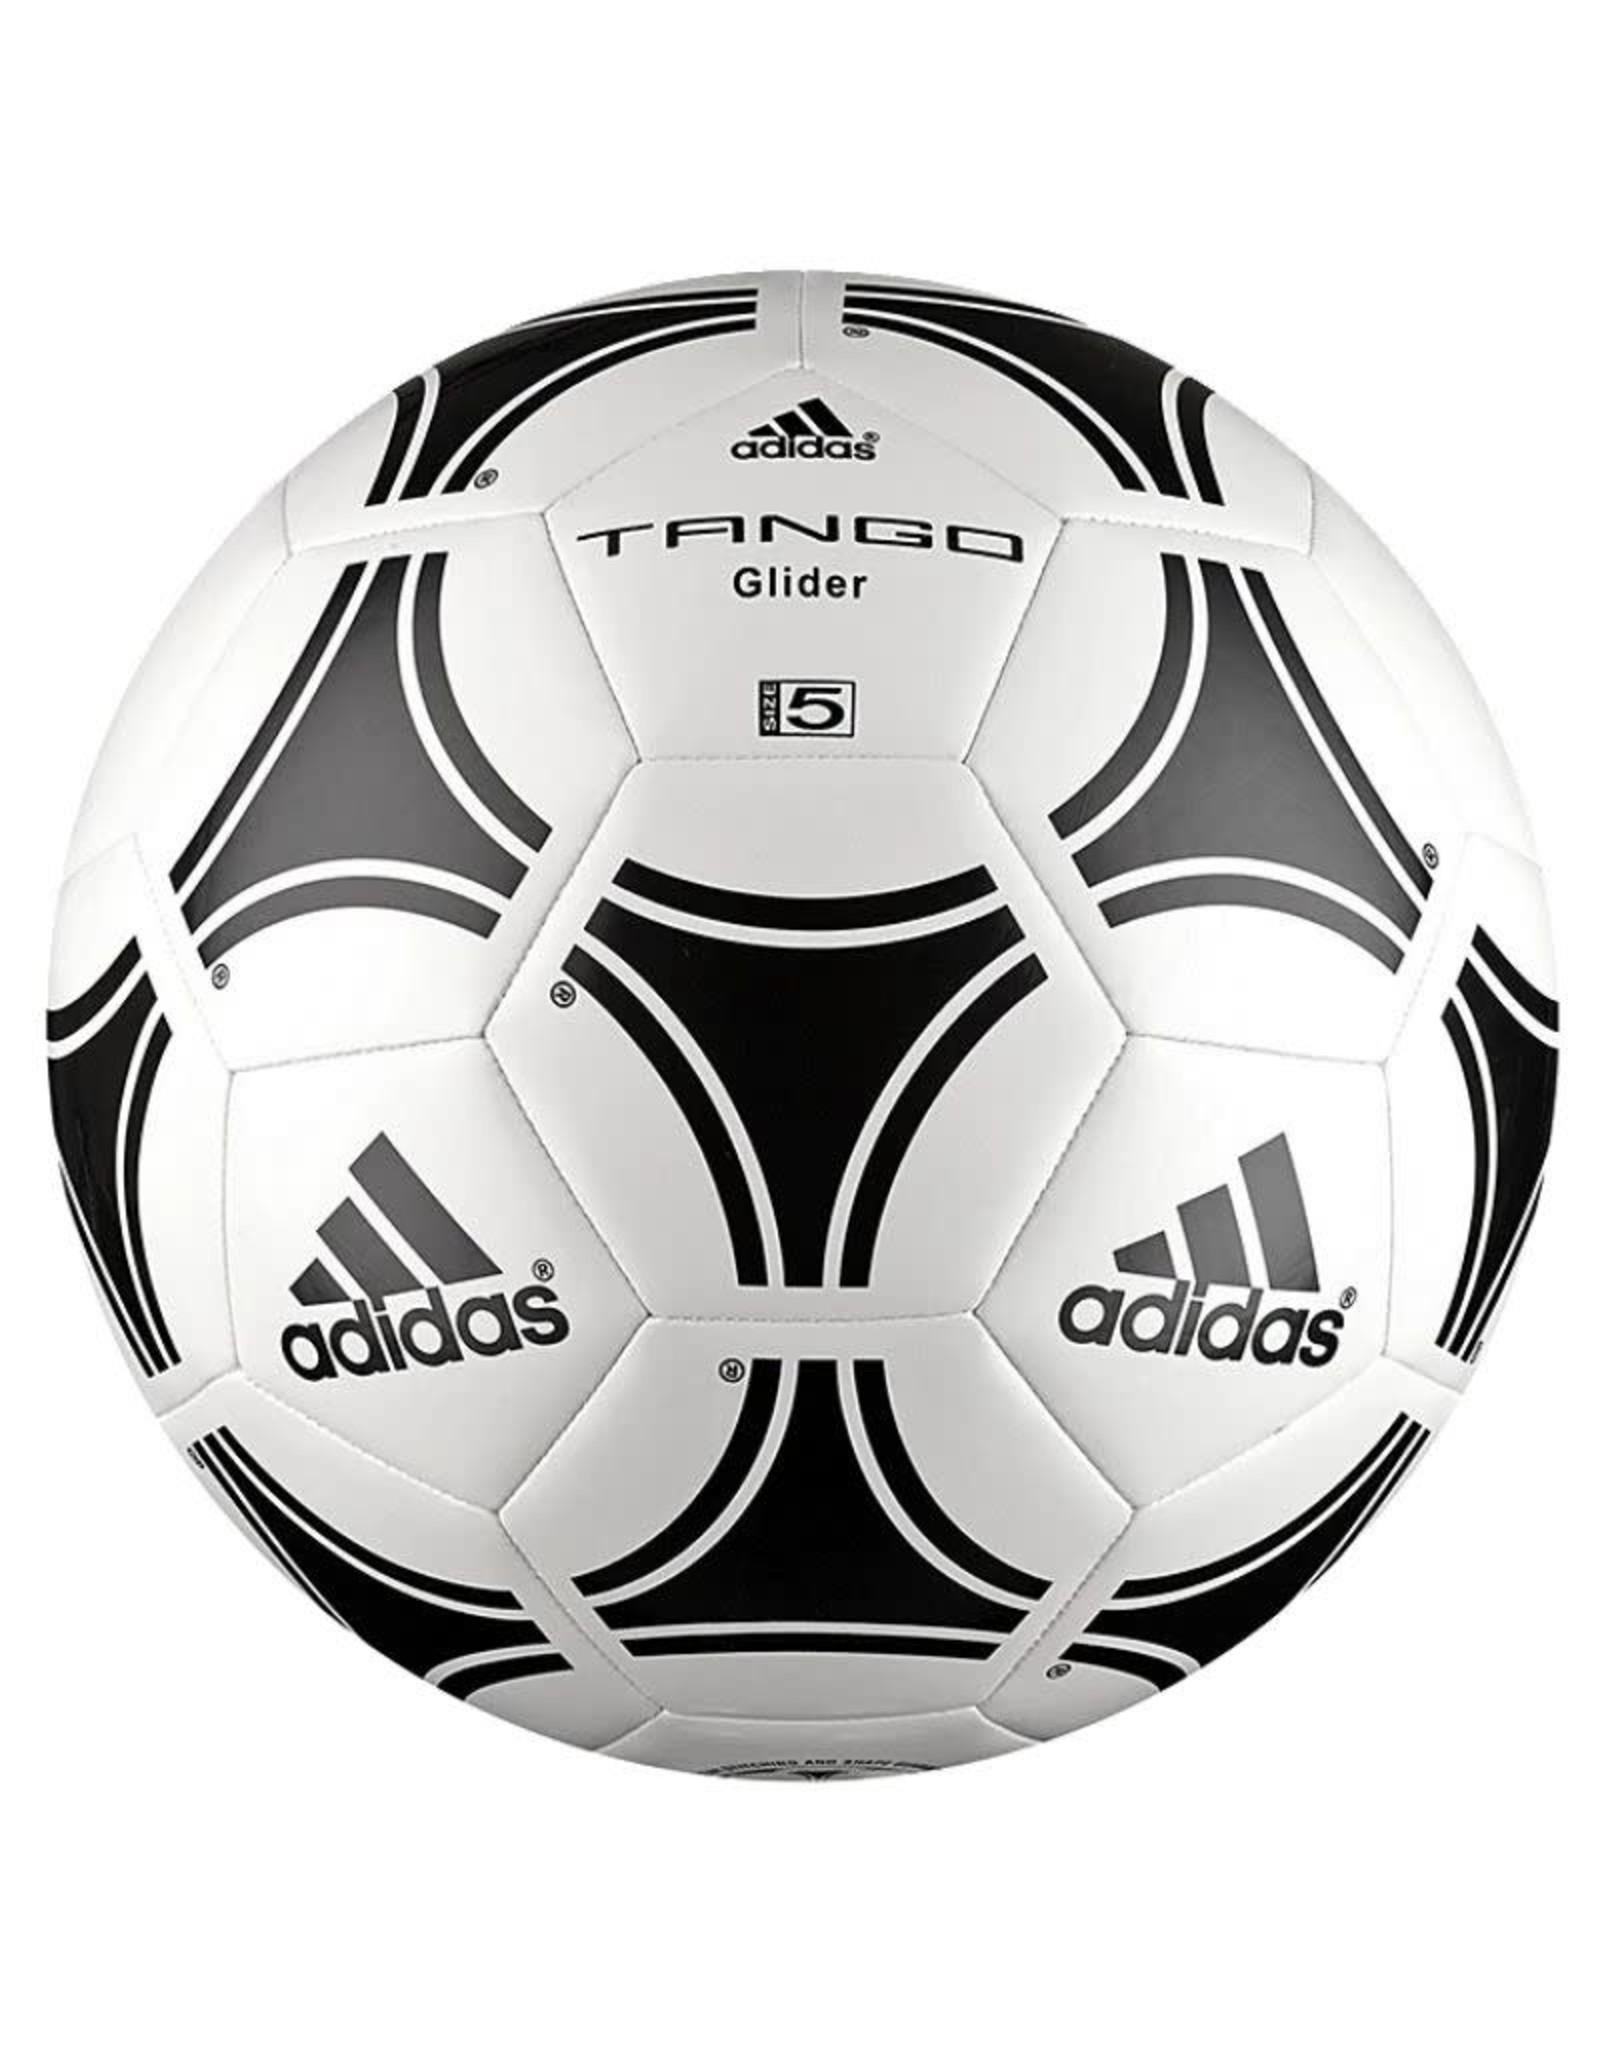 Adidas Adidas Tango Glider Soccer Ball Size 5